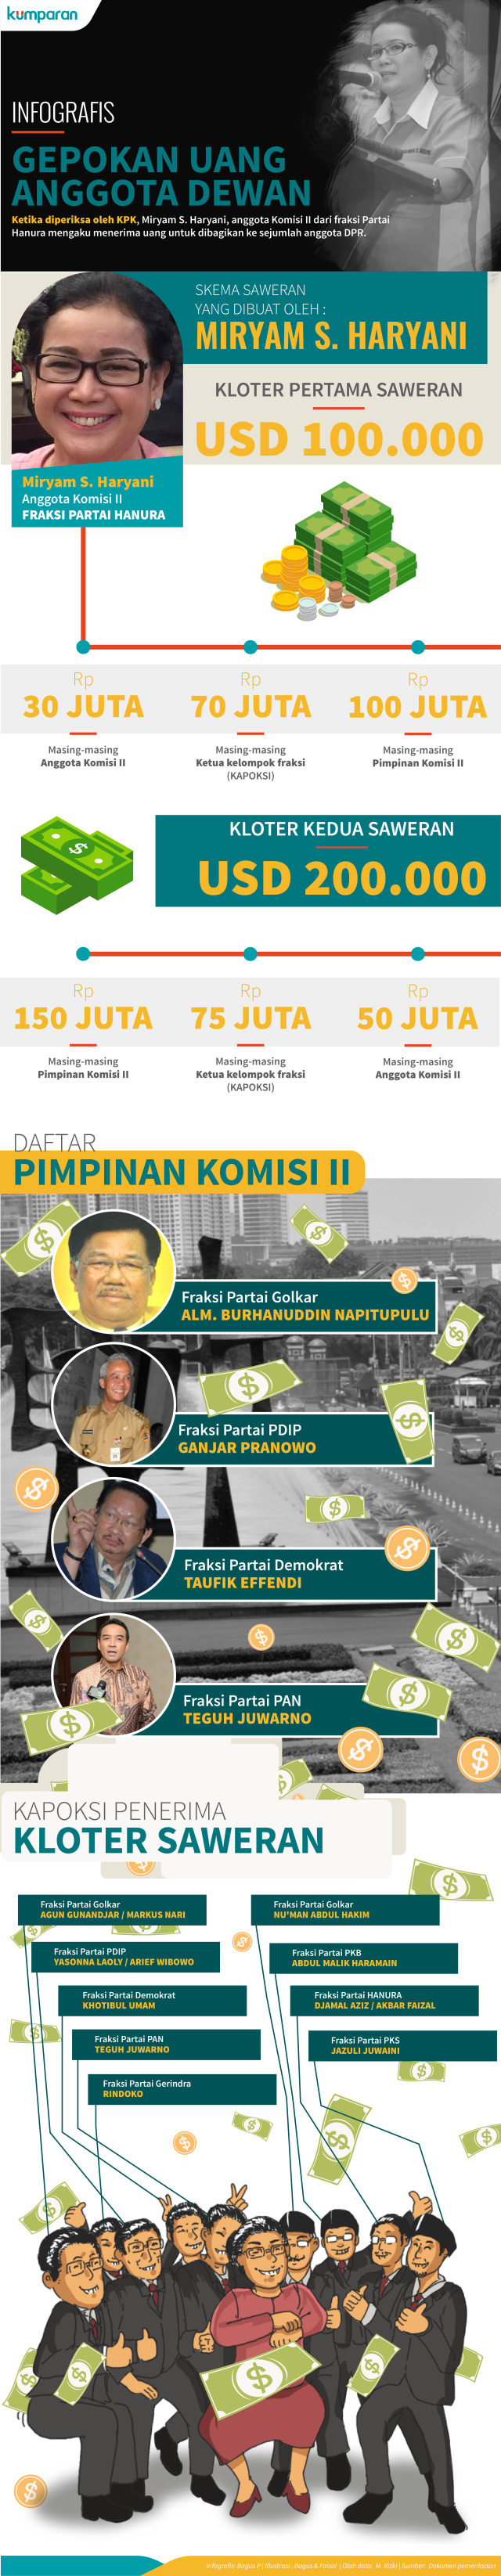 KPK Panggil 5 Anggota DPR, Termasuk Arif Wibowo dan Teguh Juwarno (103457)